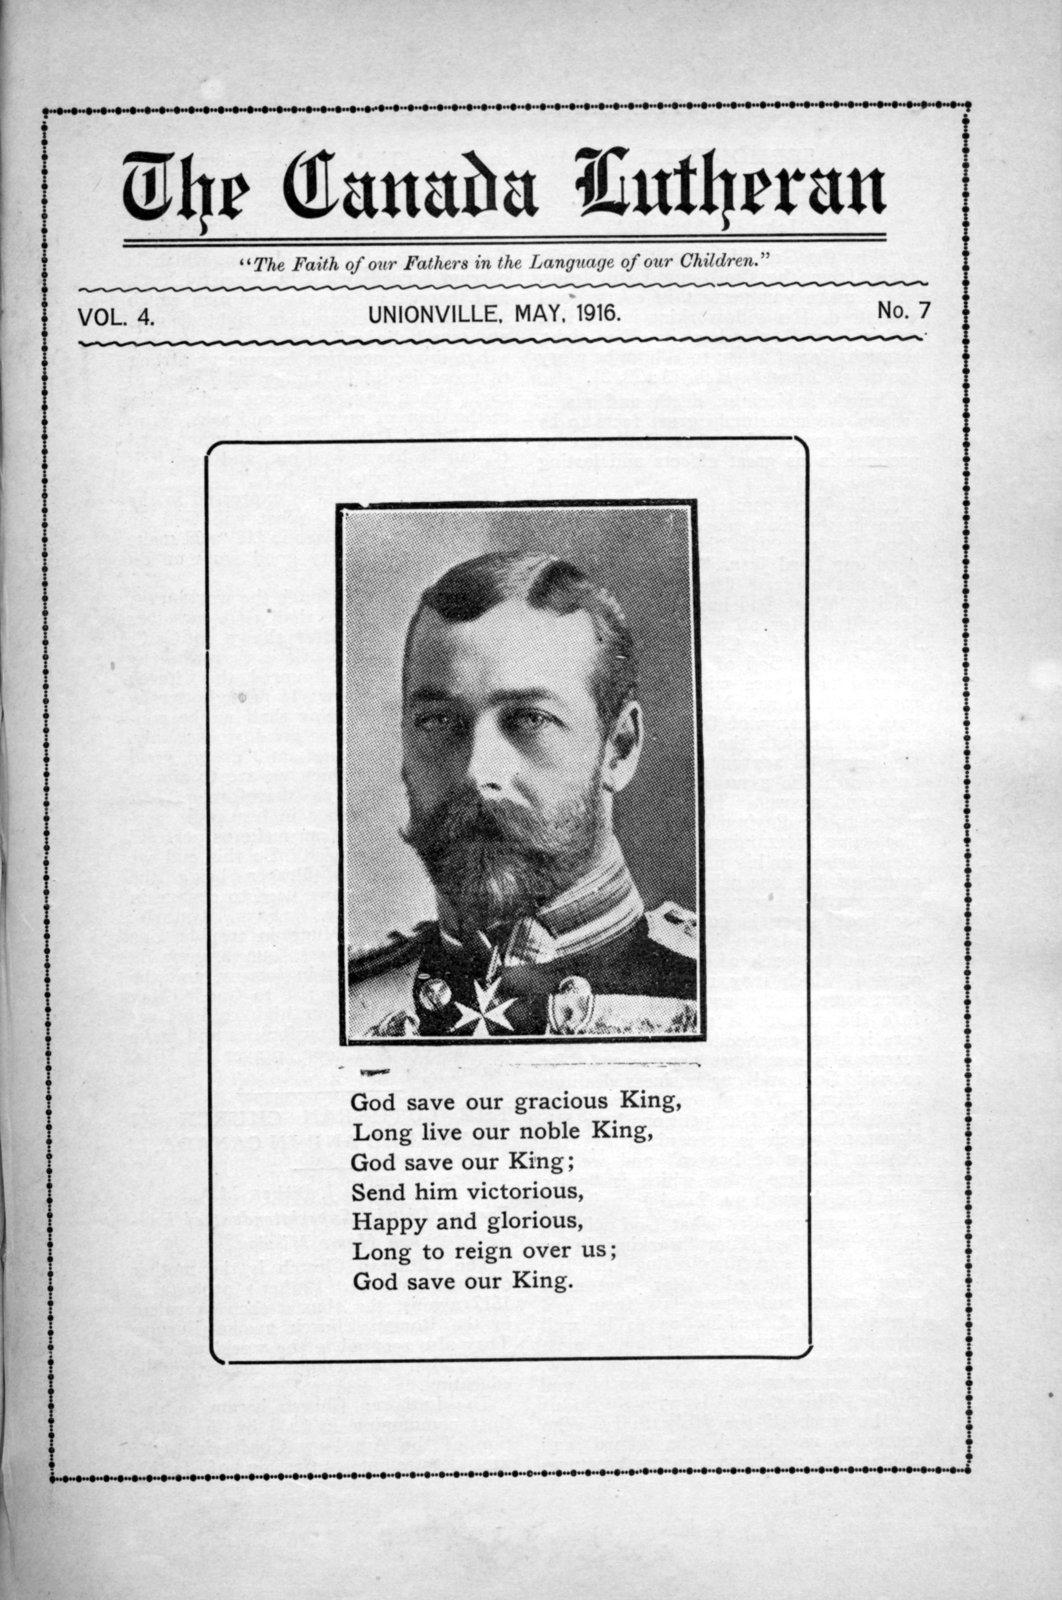 The Canada Lutheran, vol. 4, no. 7, May 1916